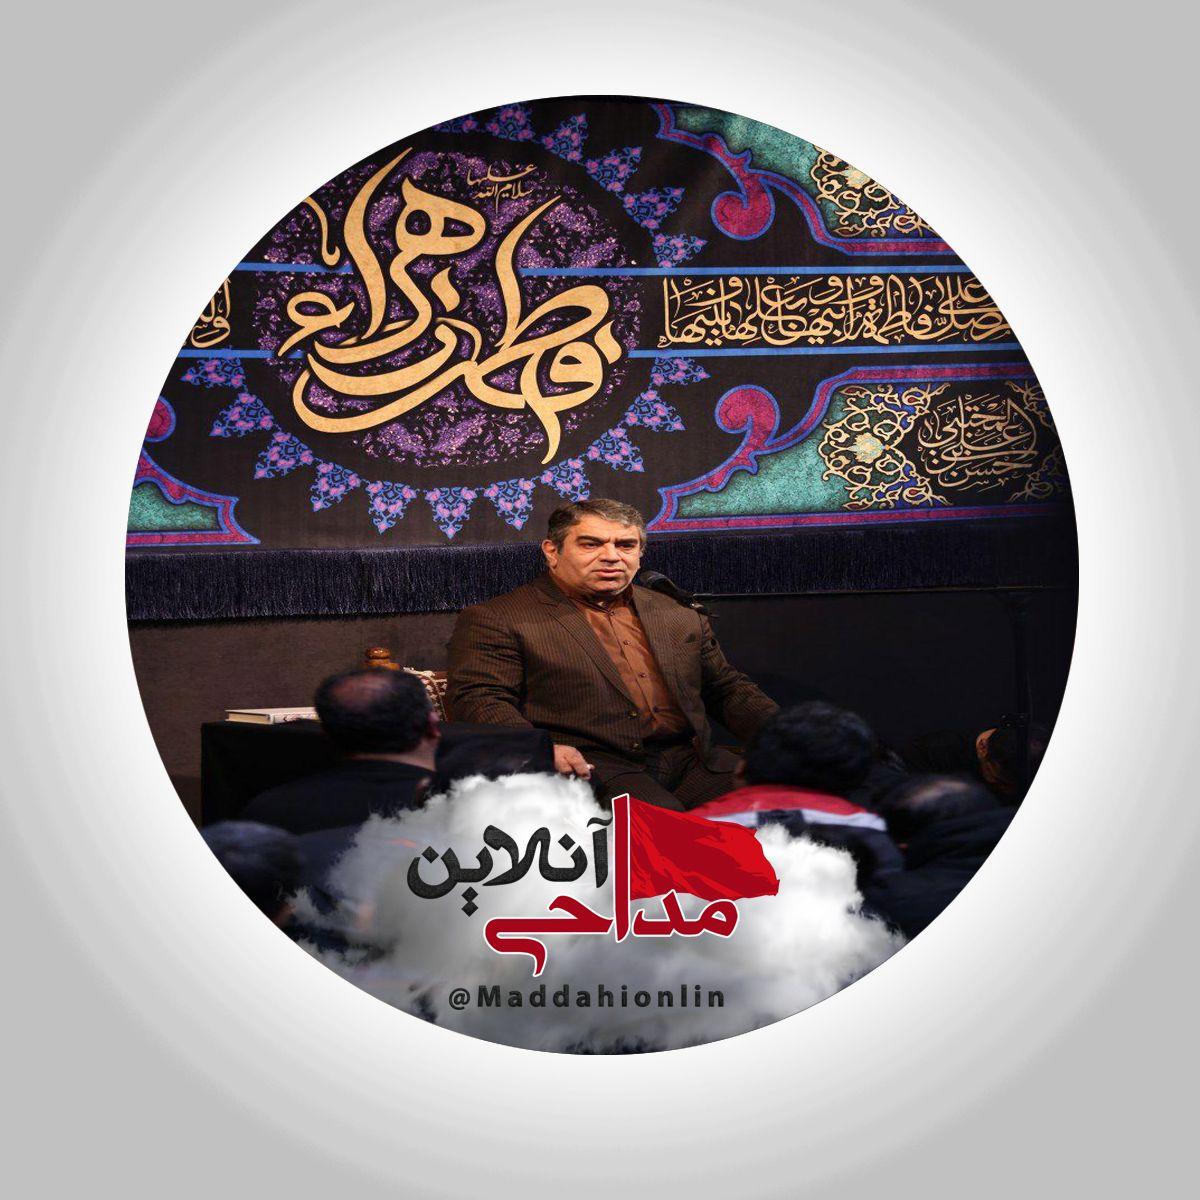 حاج حسن خلج شب چهارم محرم 98